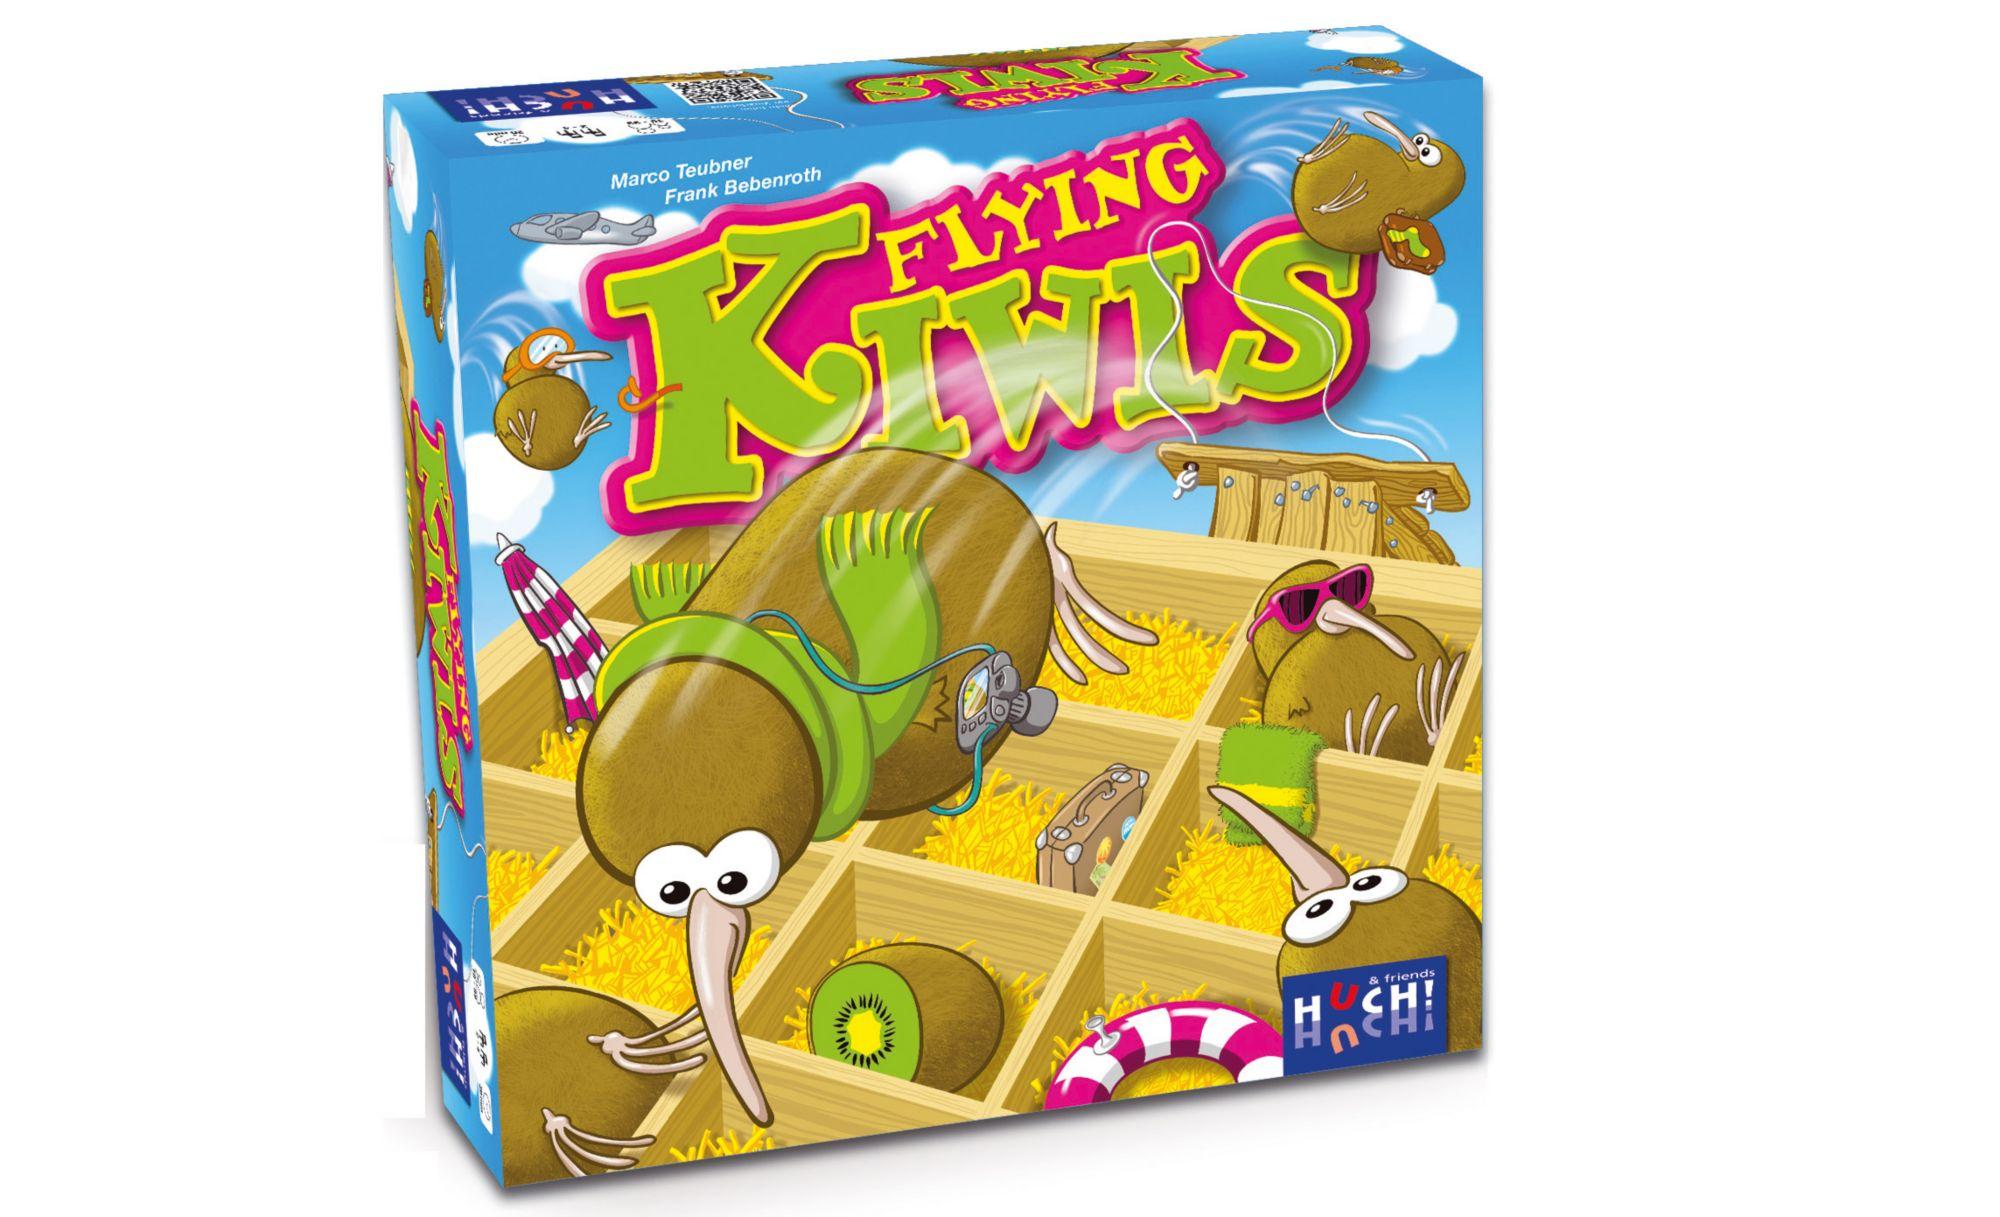 HUCH FRIENDS Huch! & friends Kinderspiel, »Flying Kiwis«